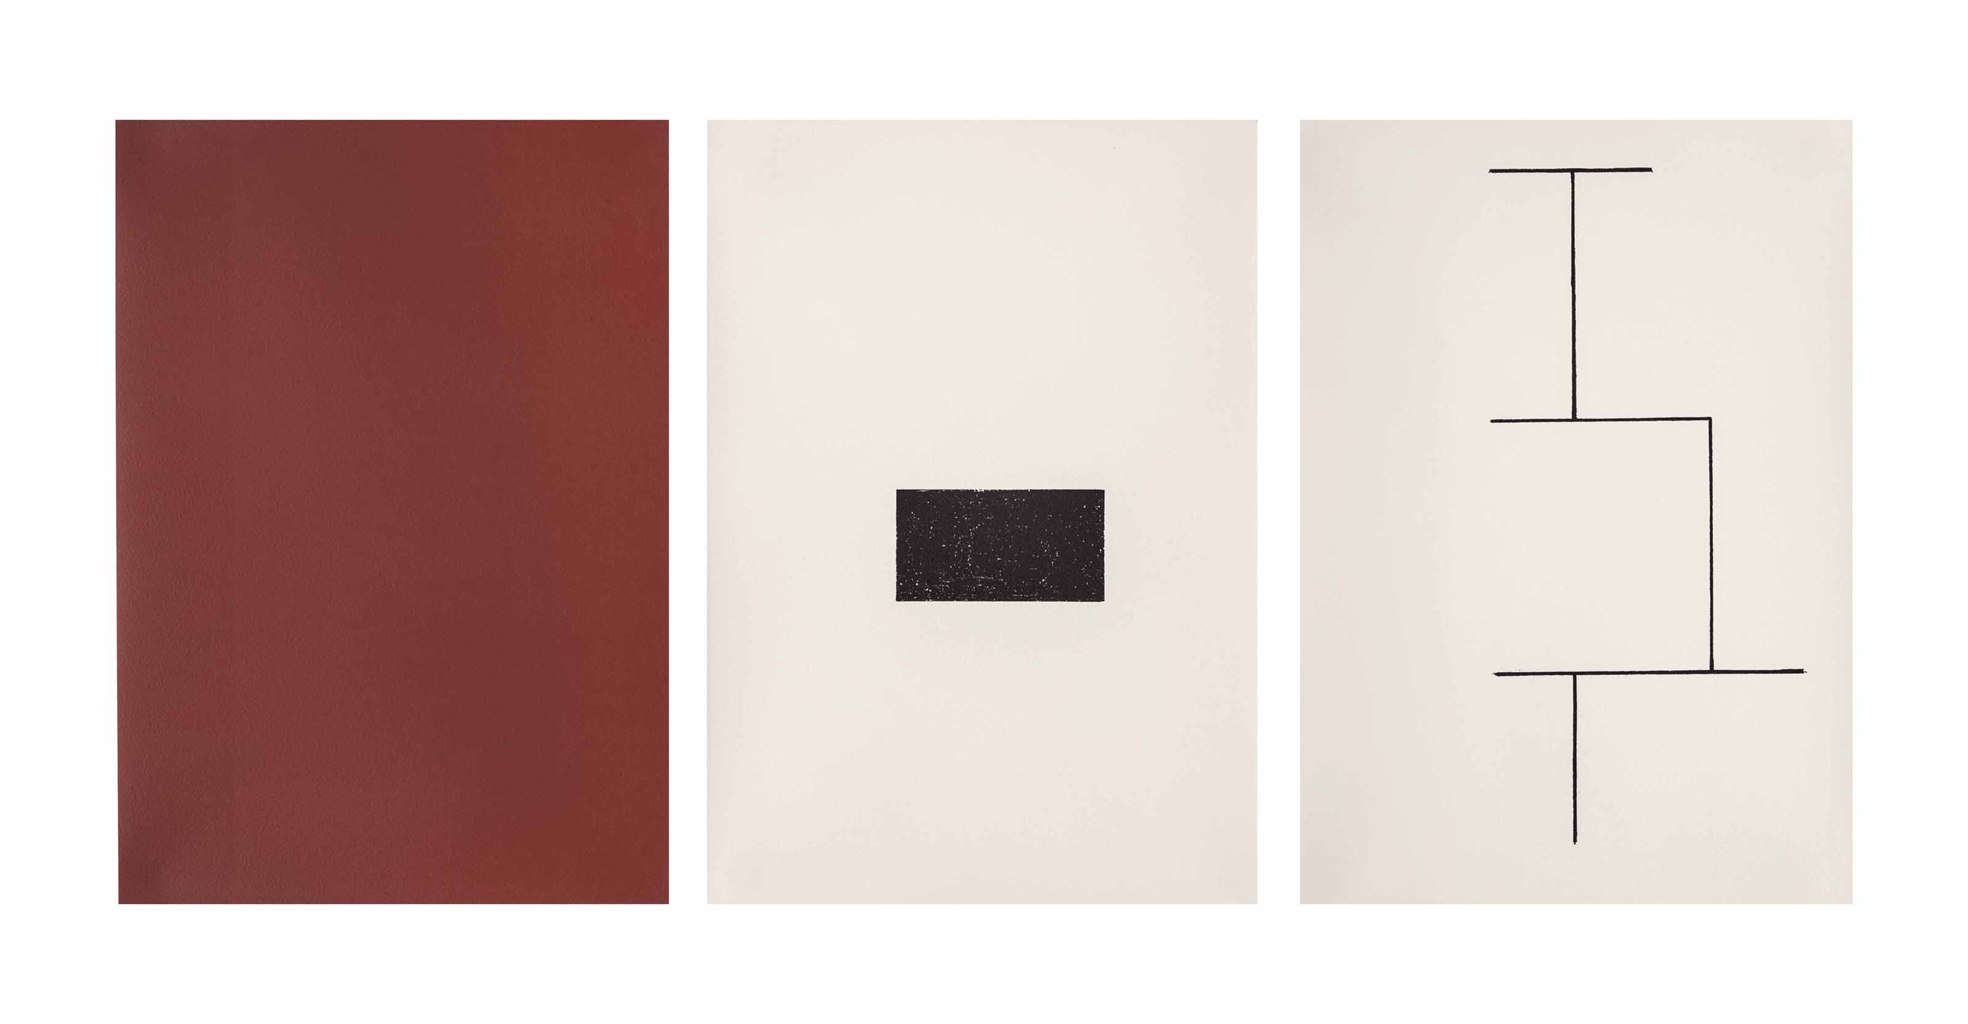 Blinky Palermo-Mappe zur Wandmalerei Hamburger Kunstverein (Jahn 33)-1973